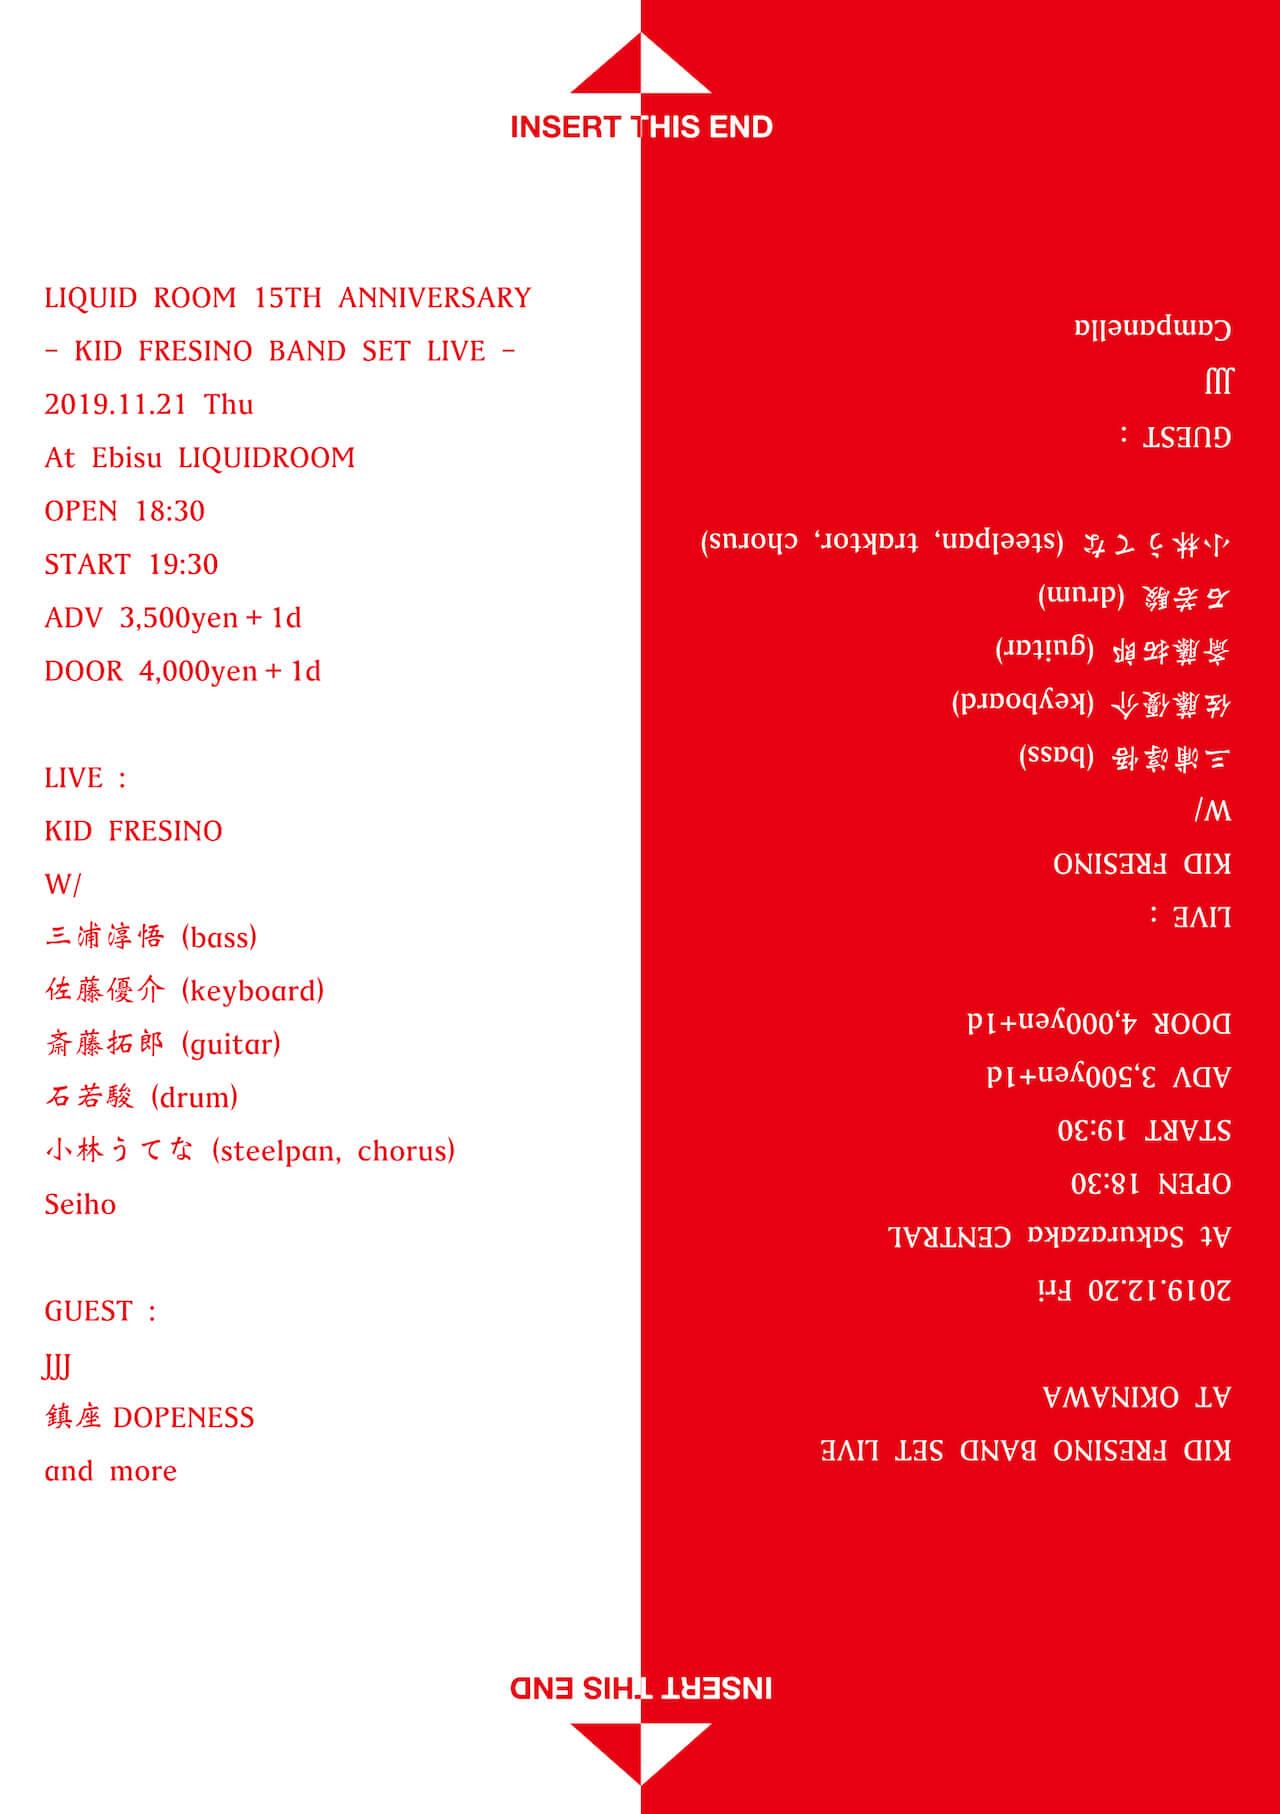 KID FRESINOがバンドセットのワンマンライブを11月東京、12月沖縄で開催|LIQUIDROOM15周年を祝う東京公演にはバンドにSeiho、客演にJJJ、鎮座DOPENESSら kidfresino